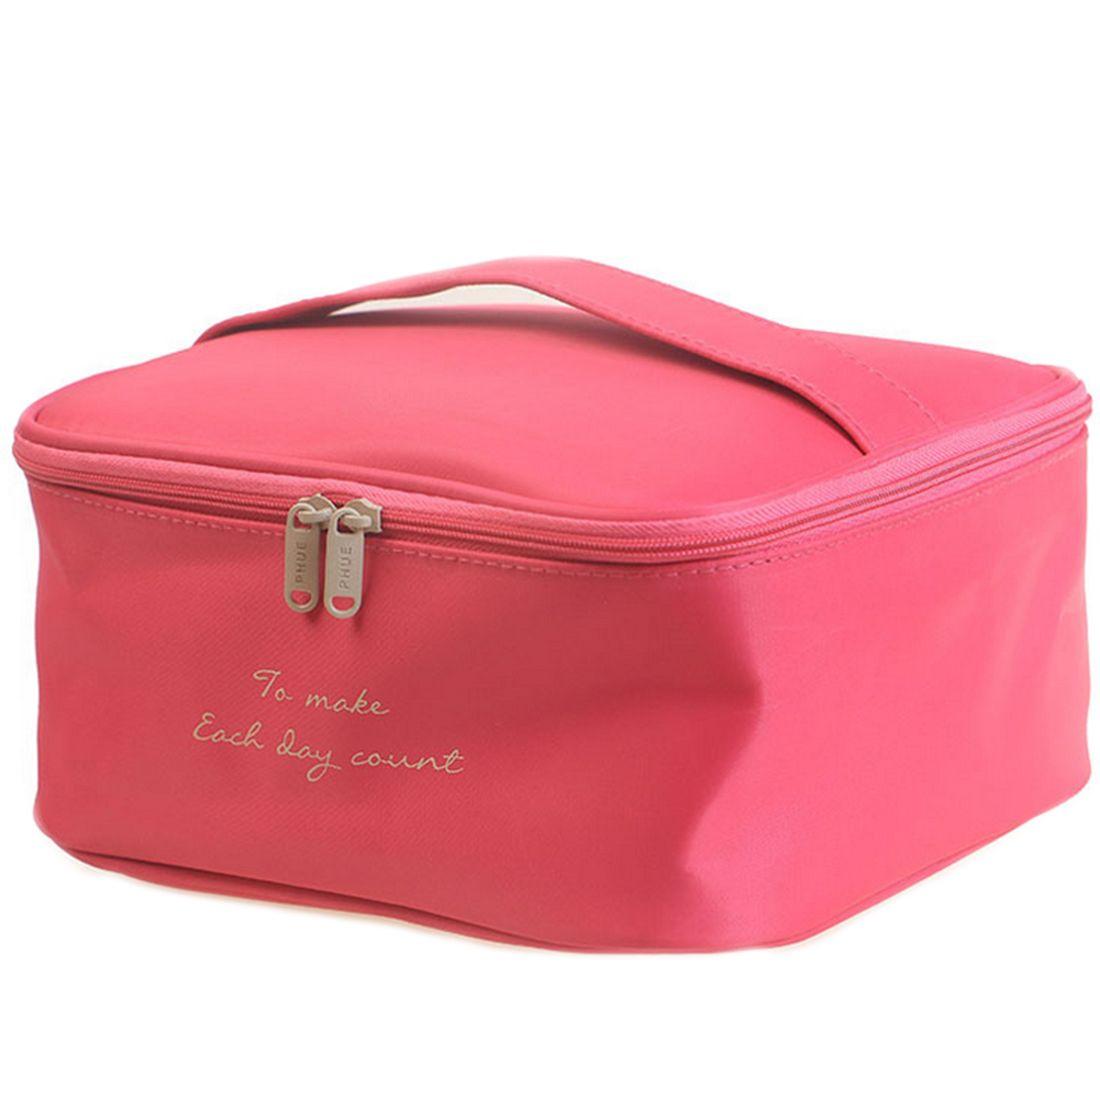 HIPSTEEN Borsa portatile grande capacità di Oxford EVA Donna Borsa cosmetica trucco Borsa da viaggio Borsa cosmetica Bambina - Rosy Red